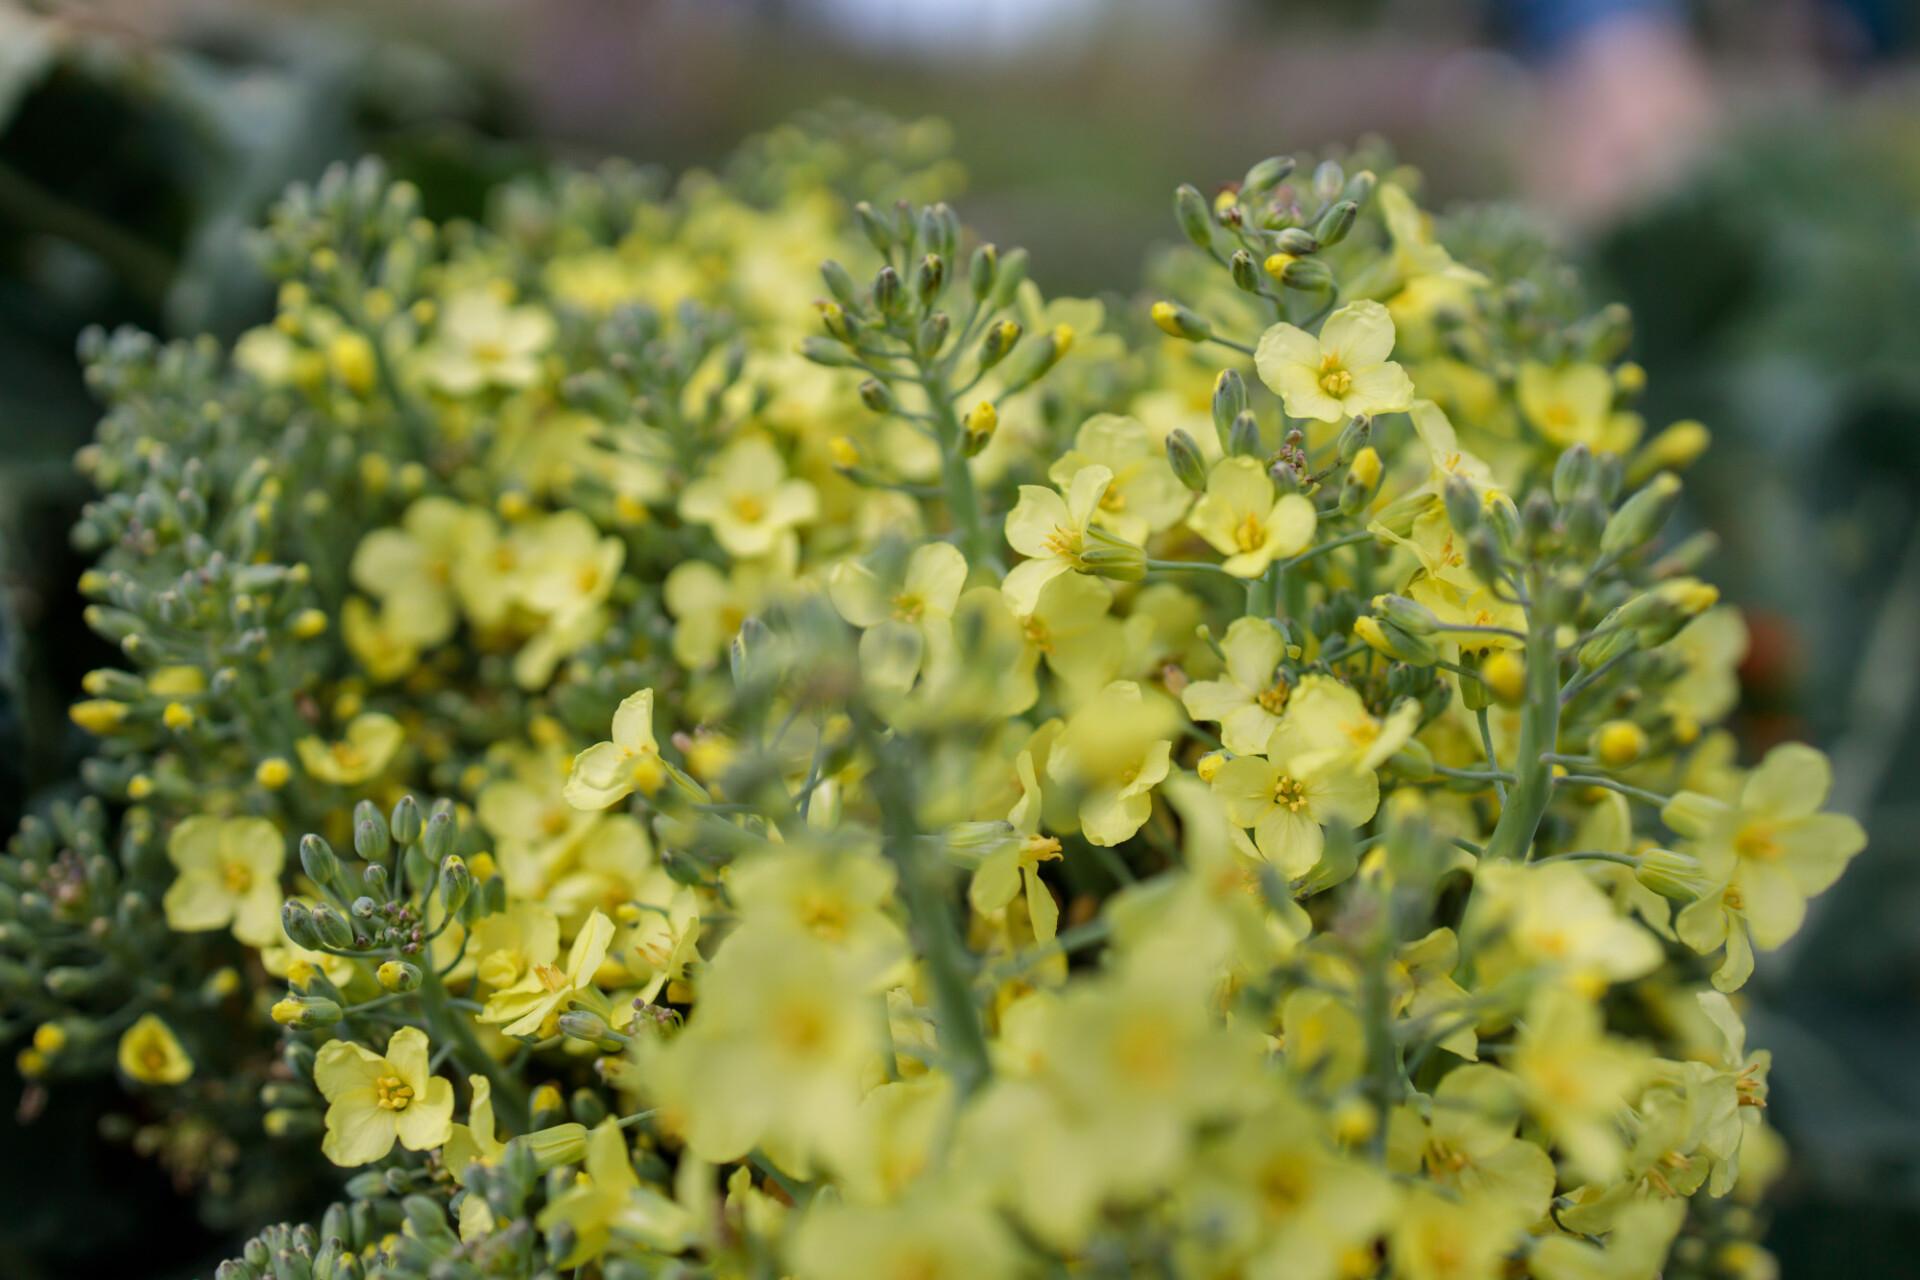 Flowering broccoli